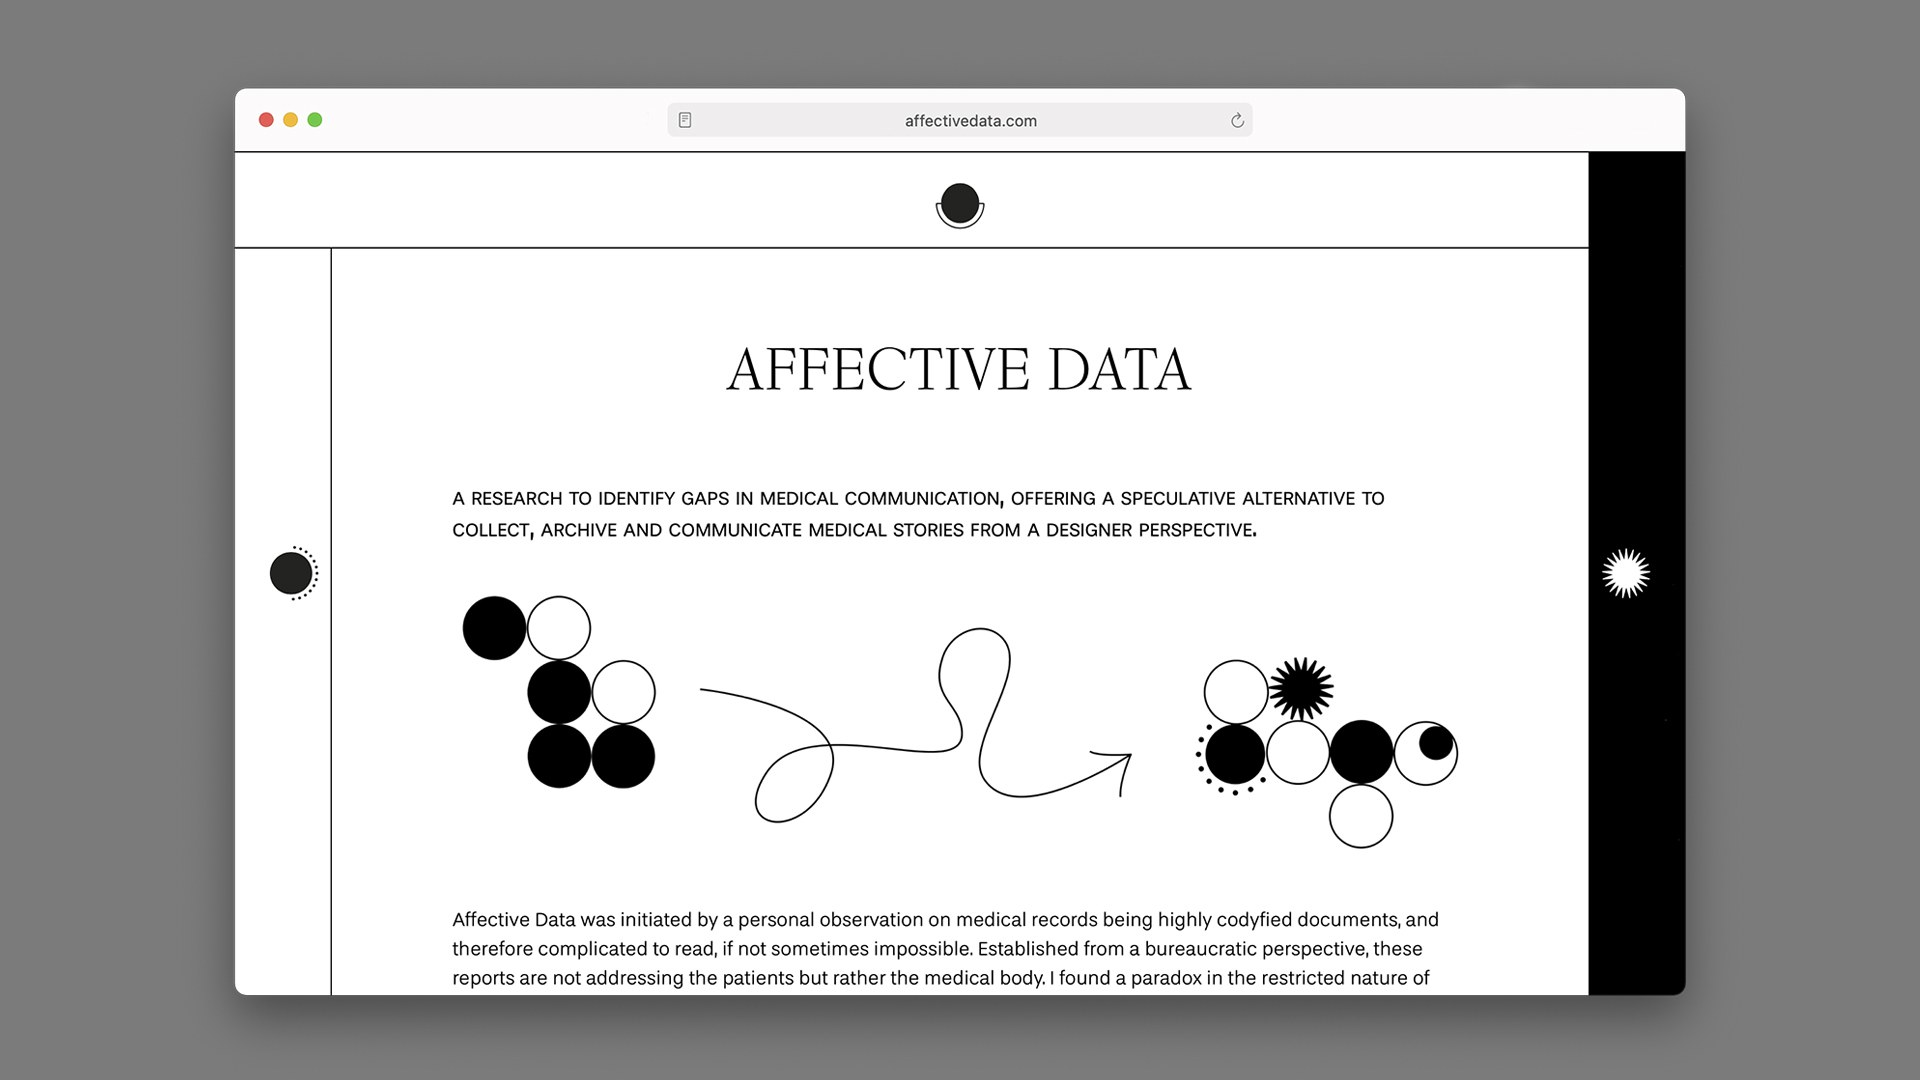 Affective Data